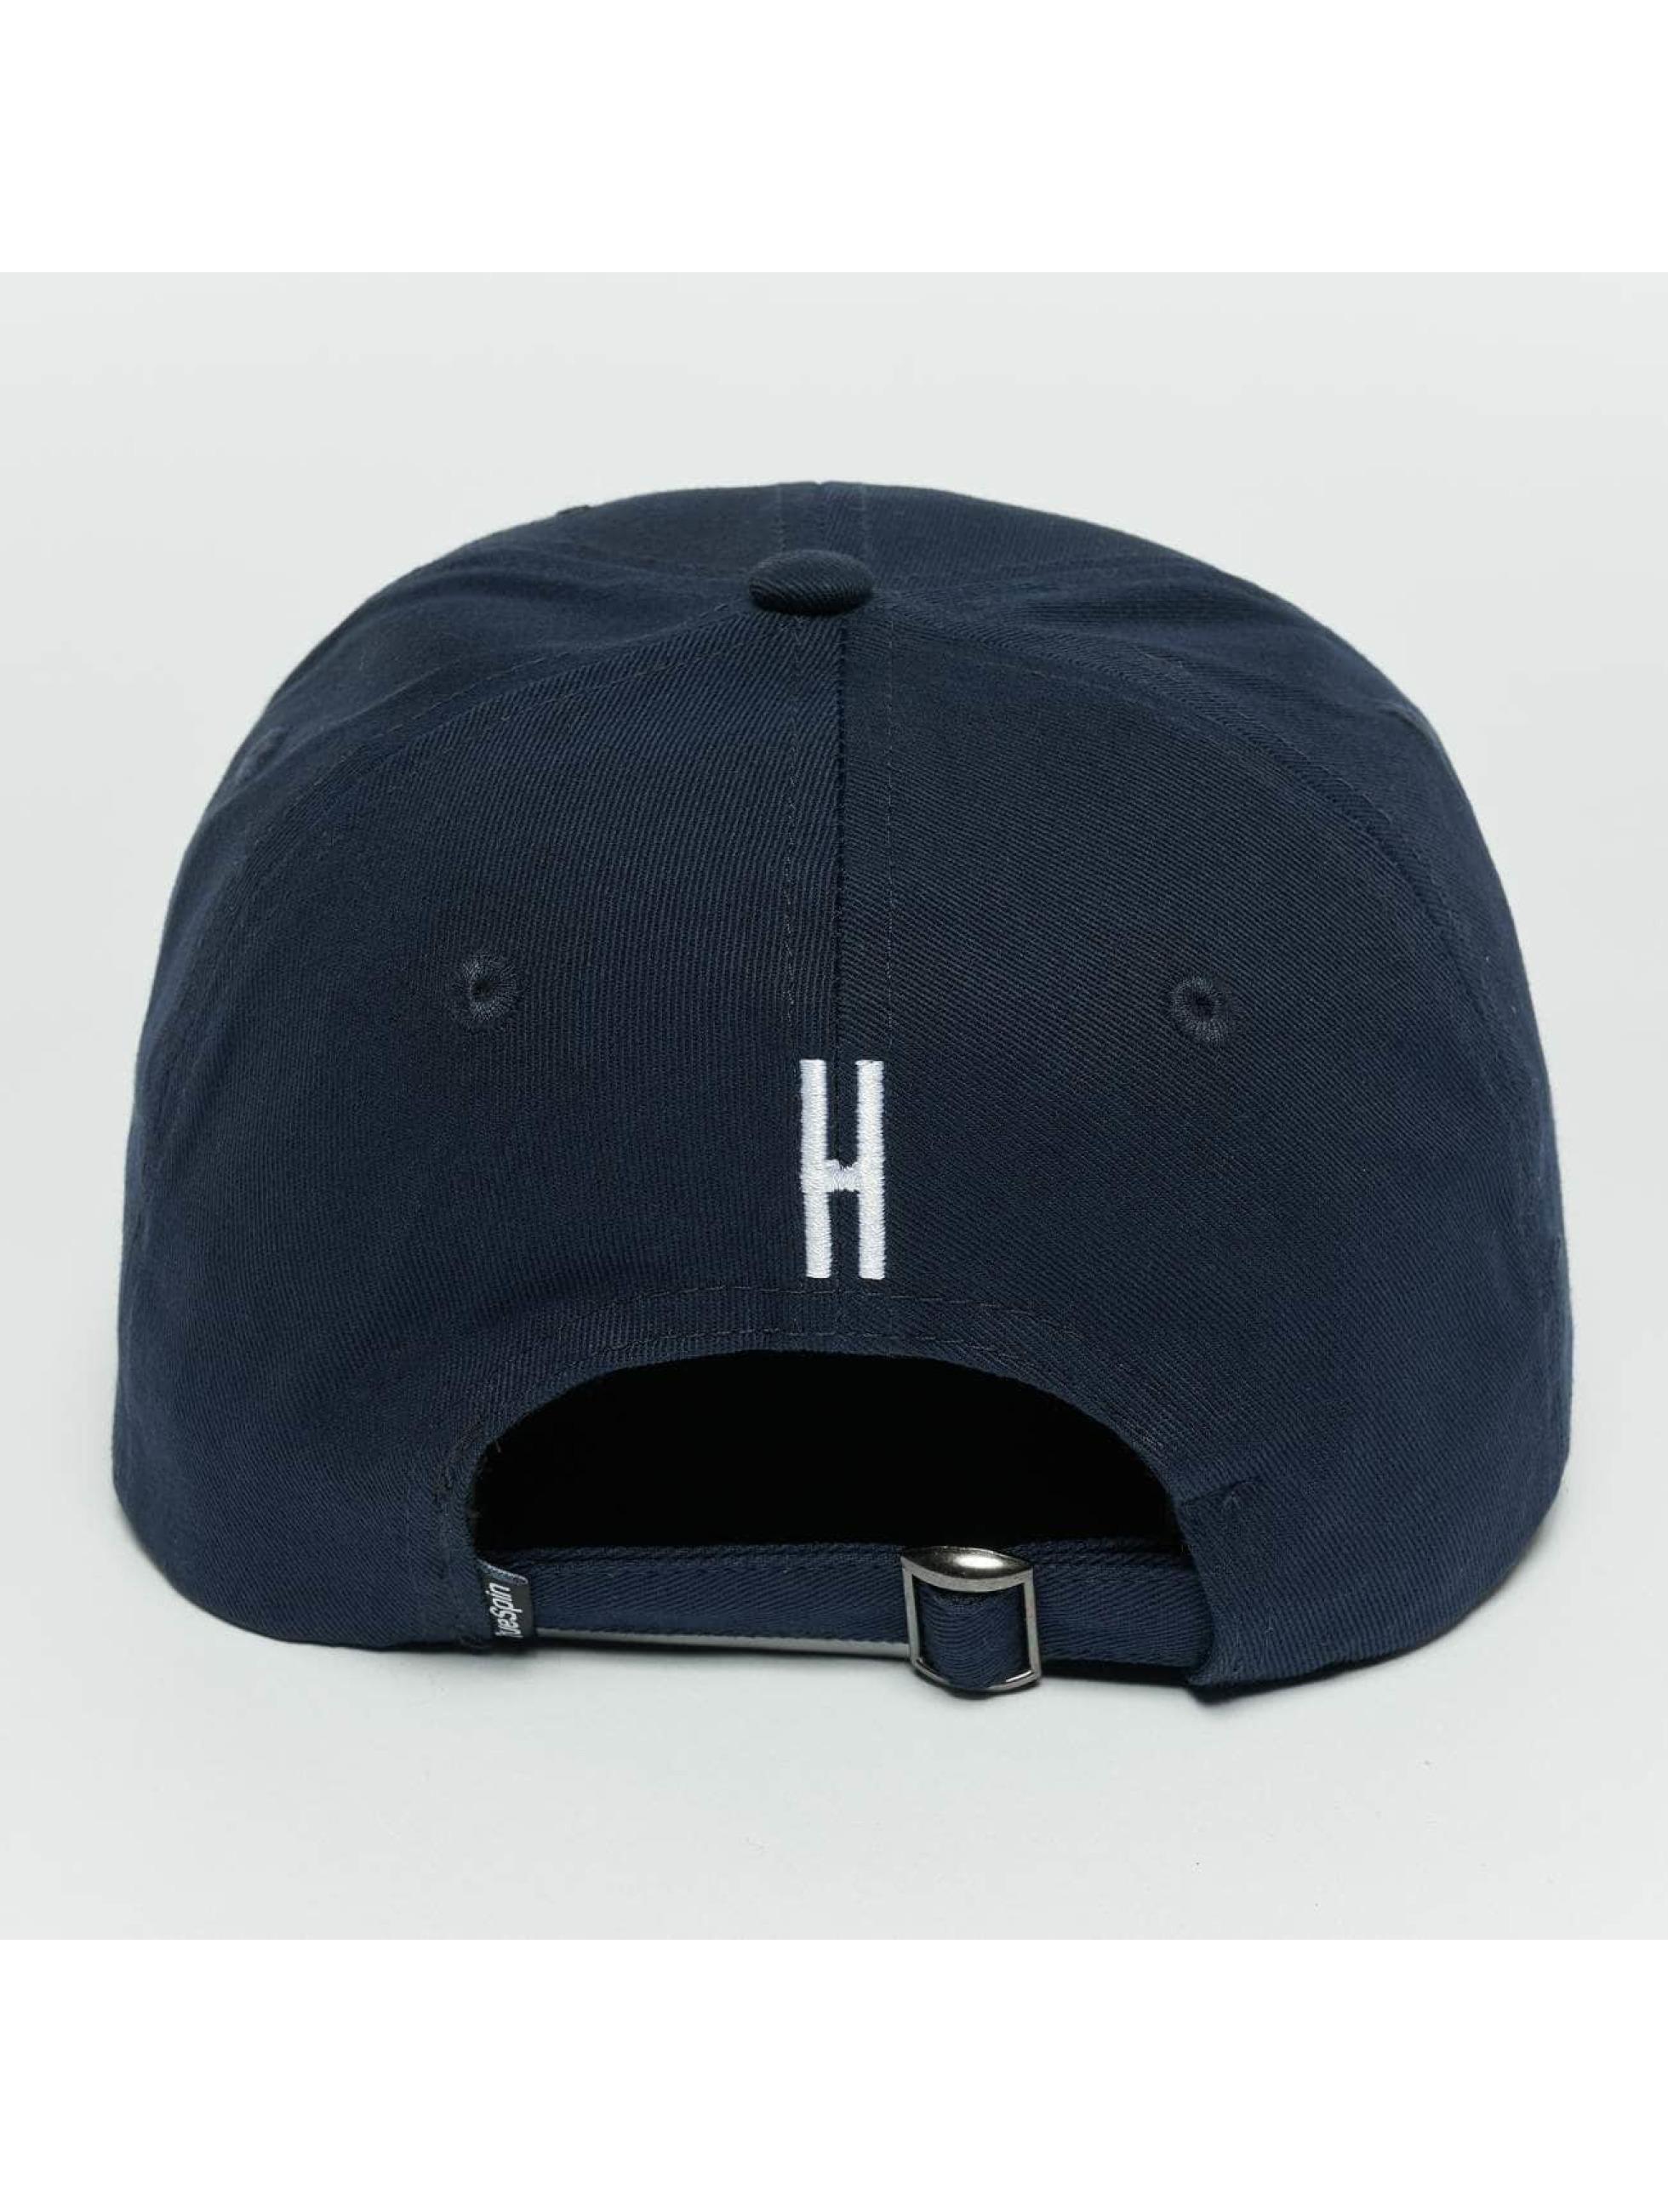 TrueSpin Casquette Snapback & Strapback ABC H bleu